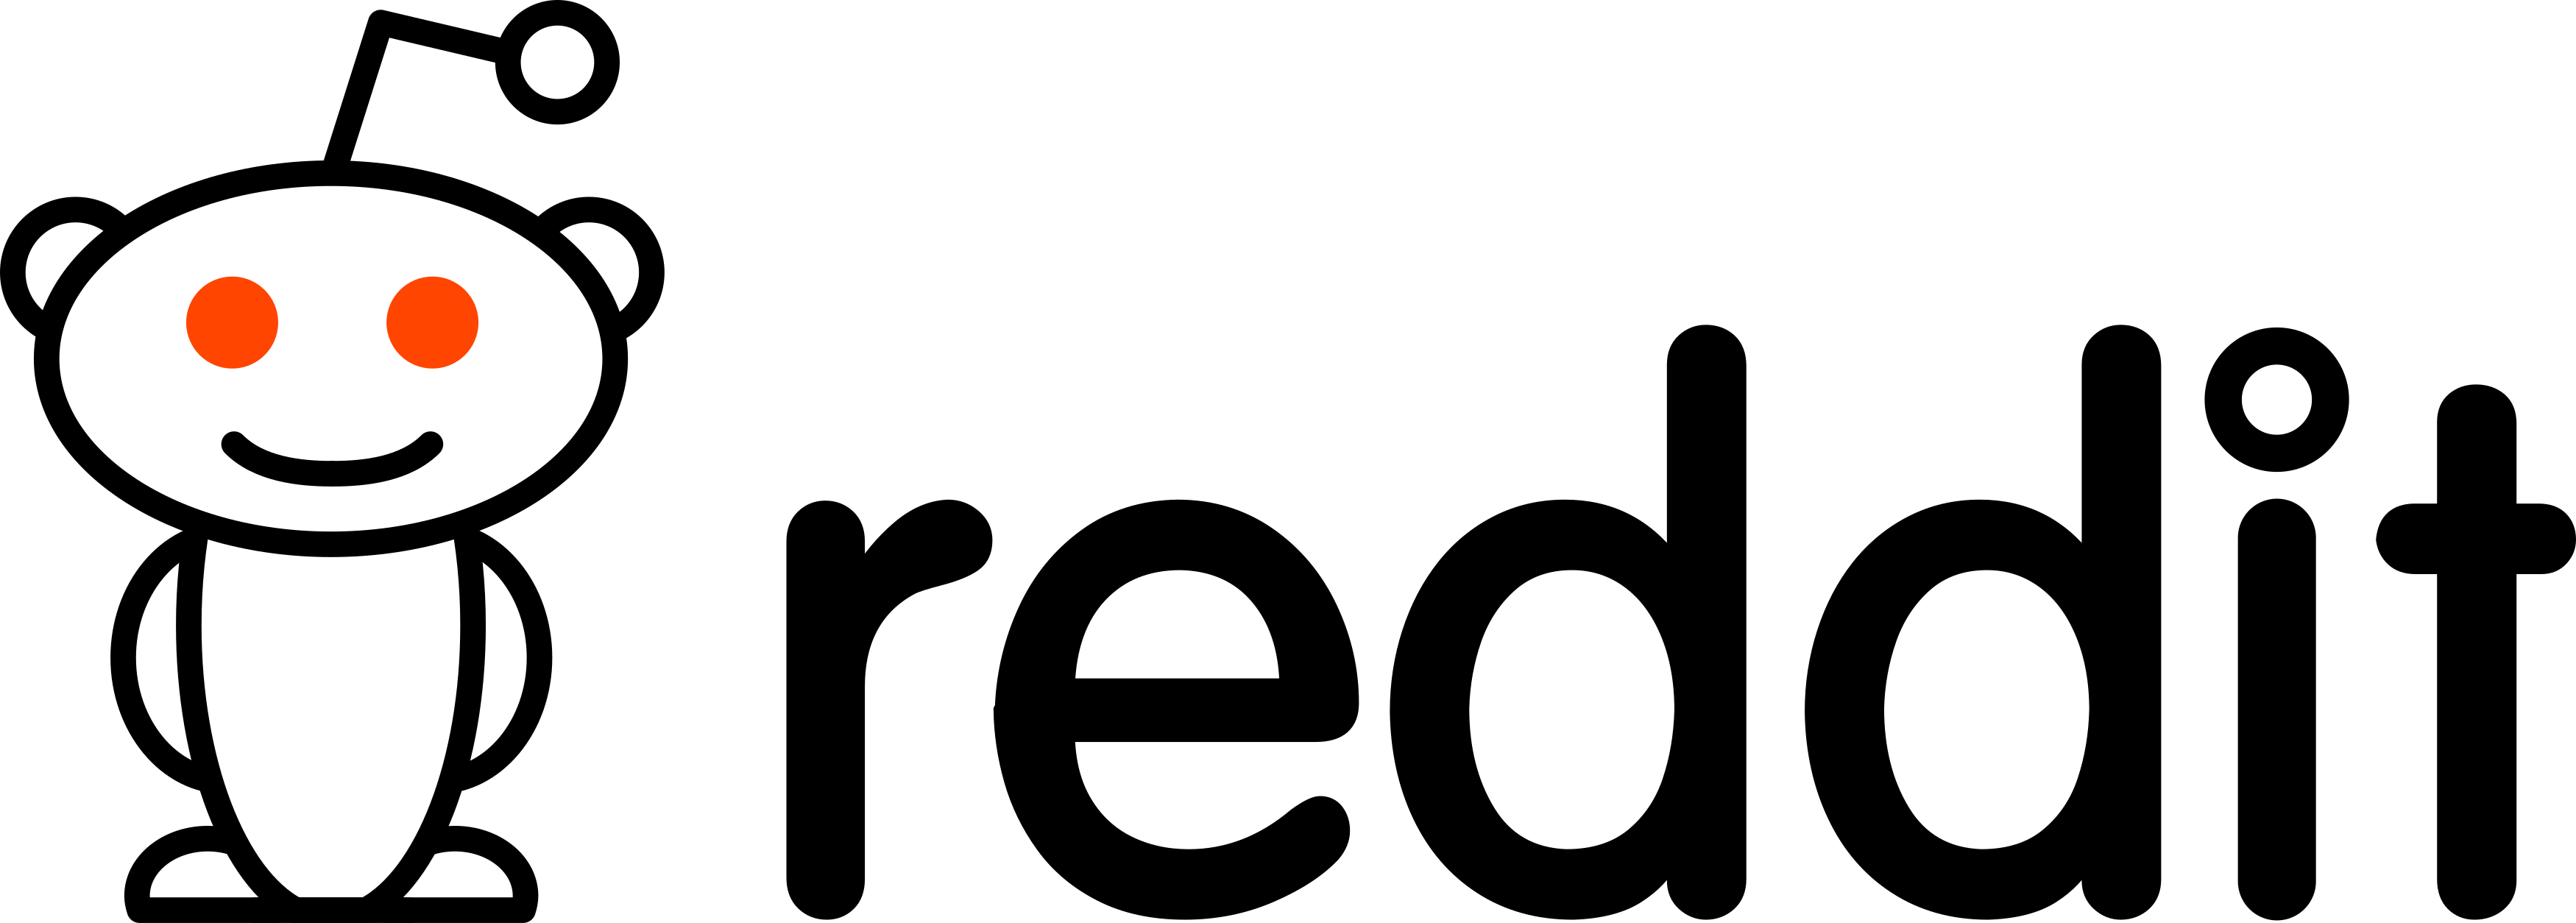 reddit logo 1 - Reddit Logo